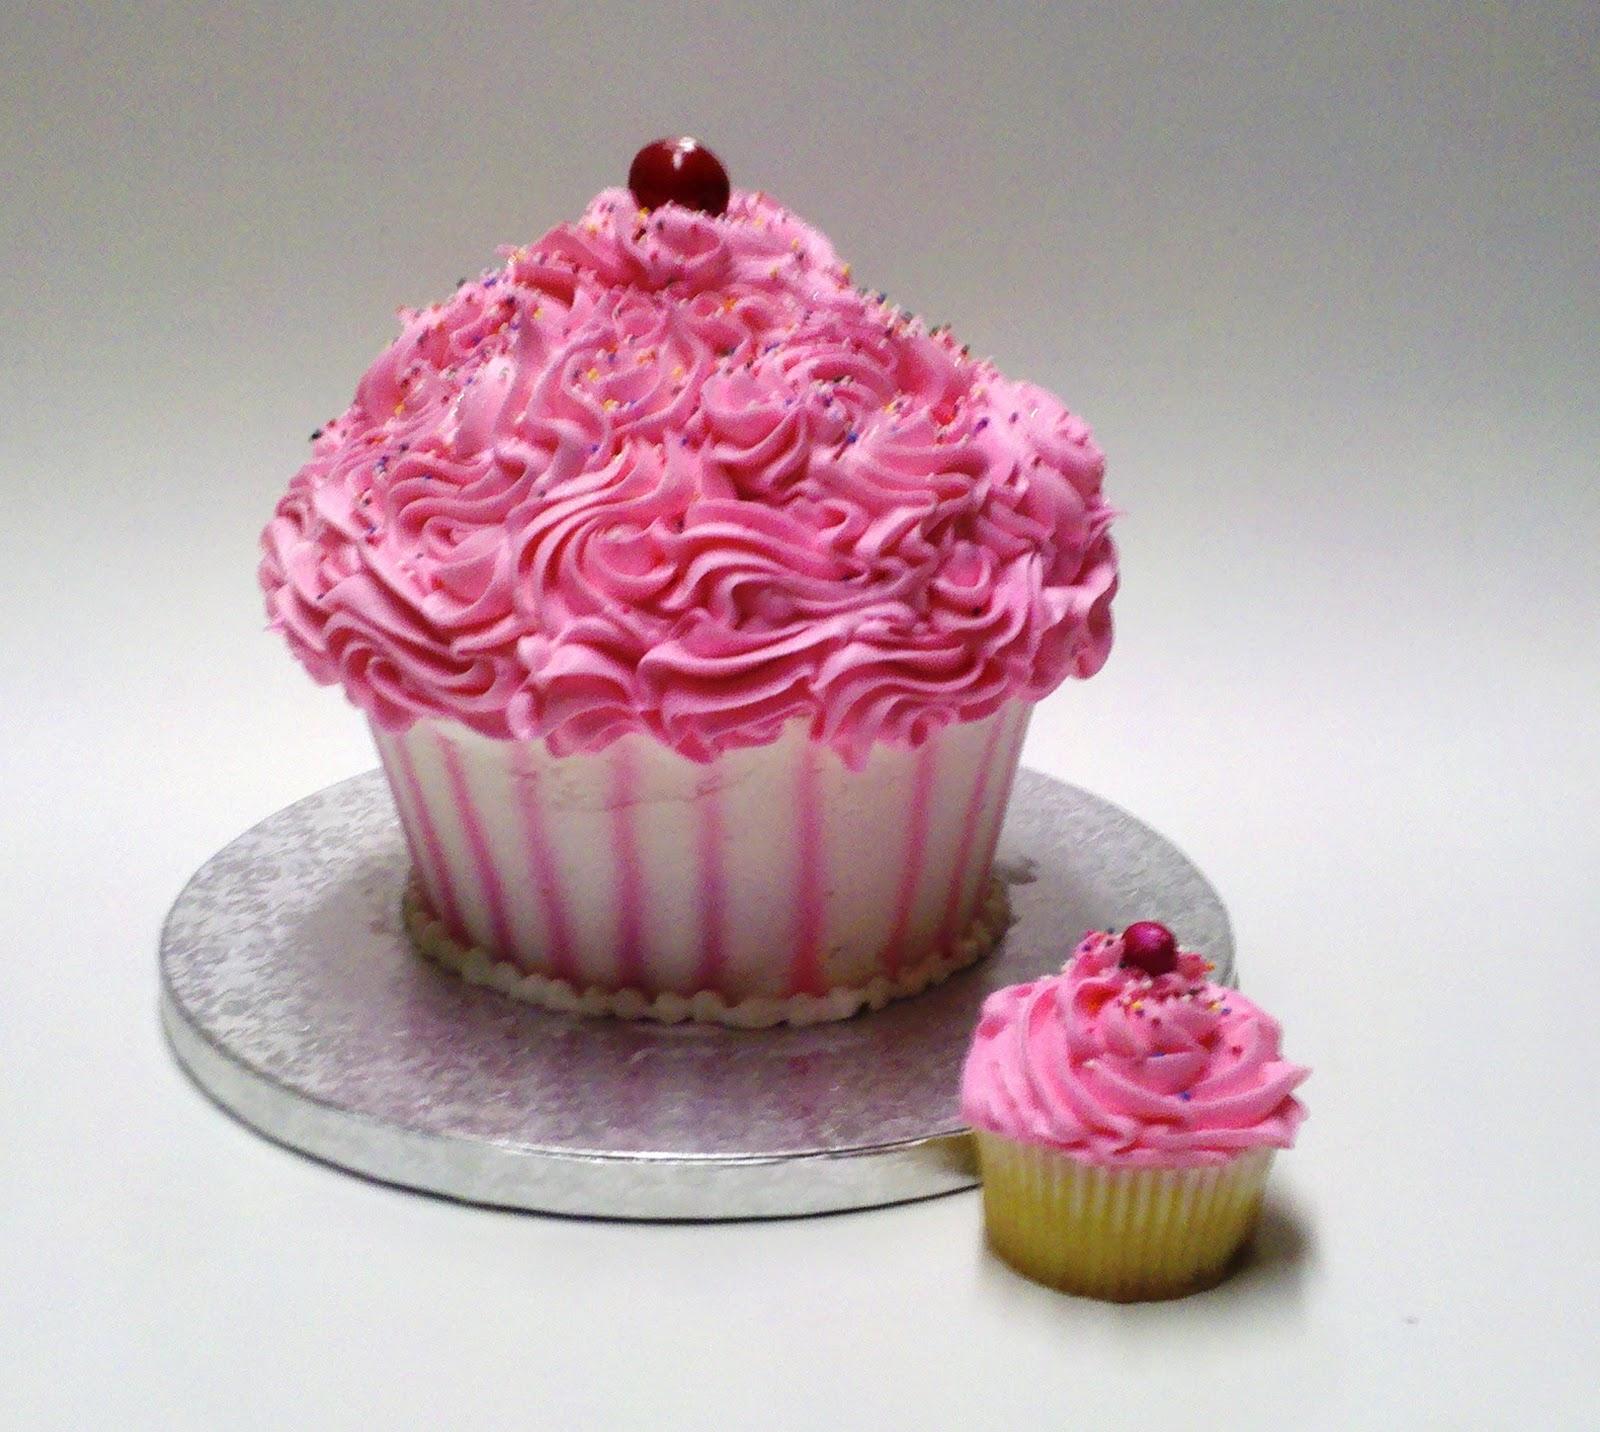 Cupcake Shaped Cake